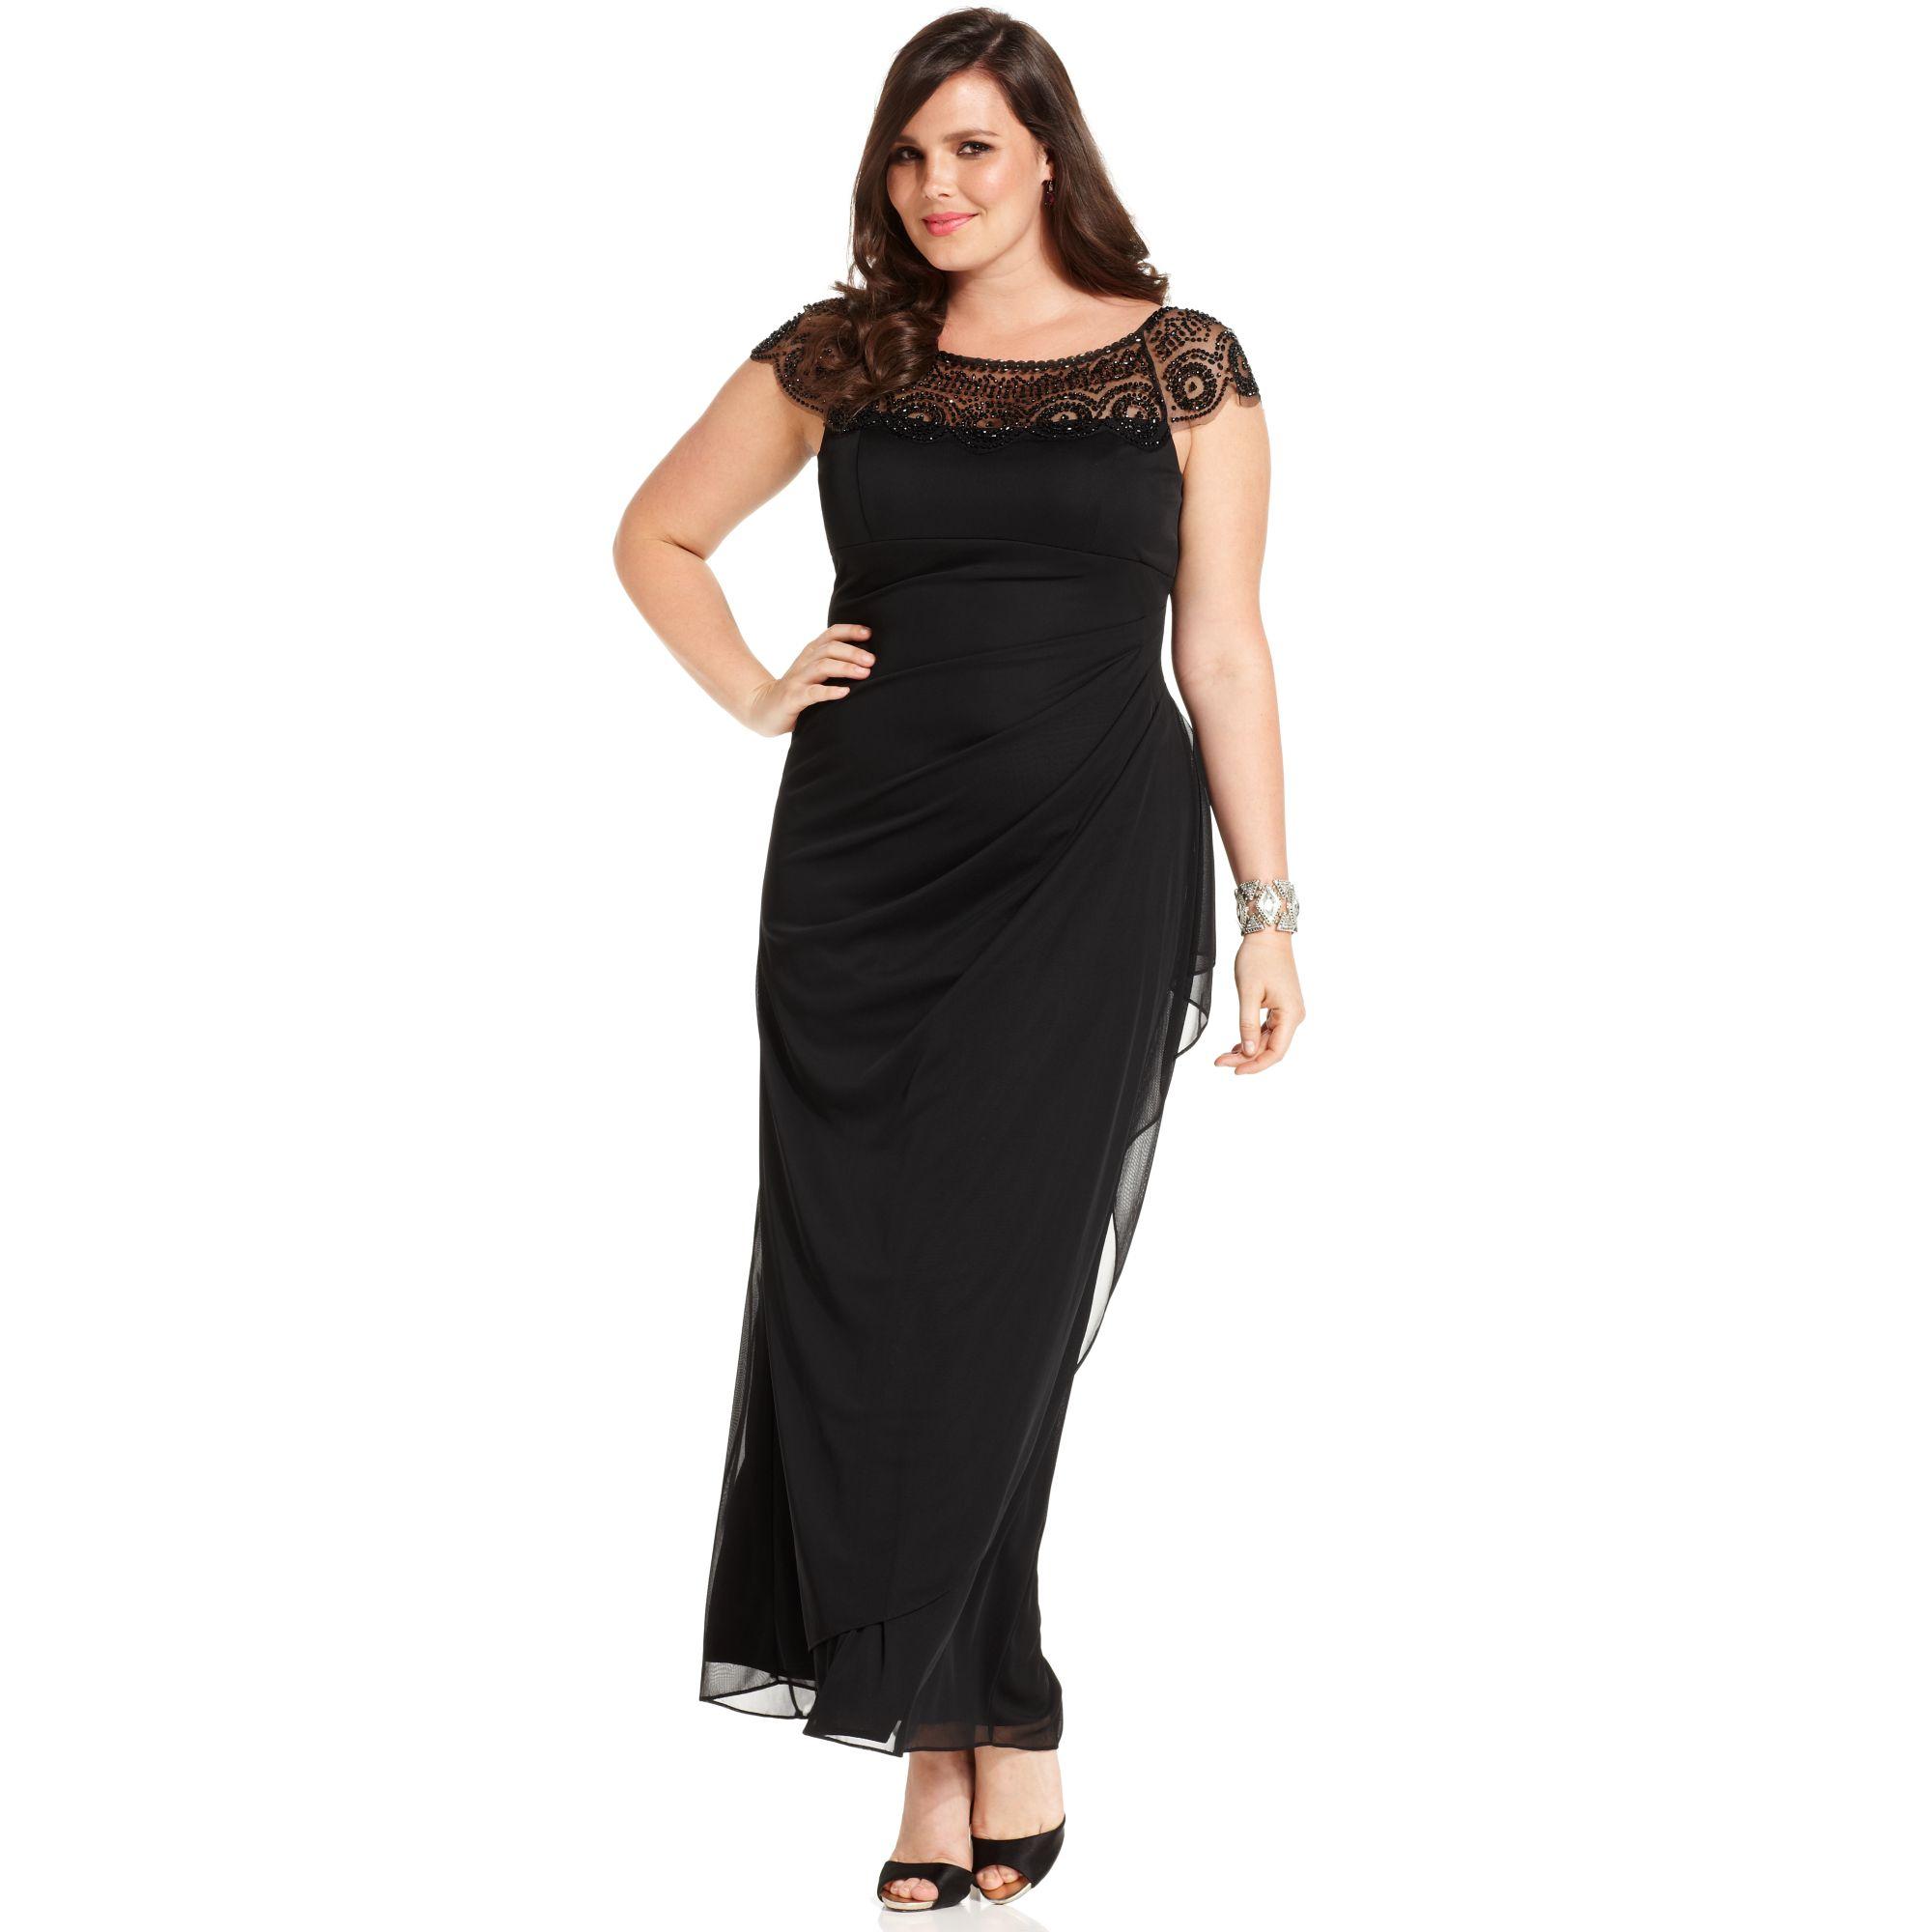 32d2f02173 Xscape Xscape Plus Size Dress Cap Sleeve Beaded Draped in Black - Lyst